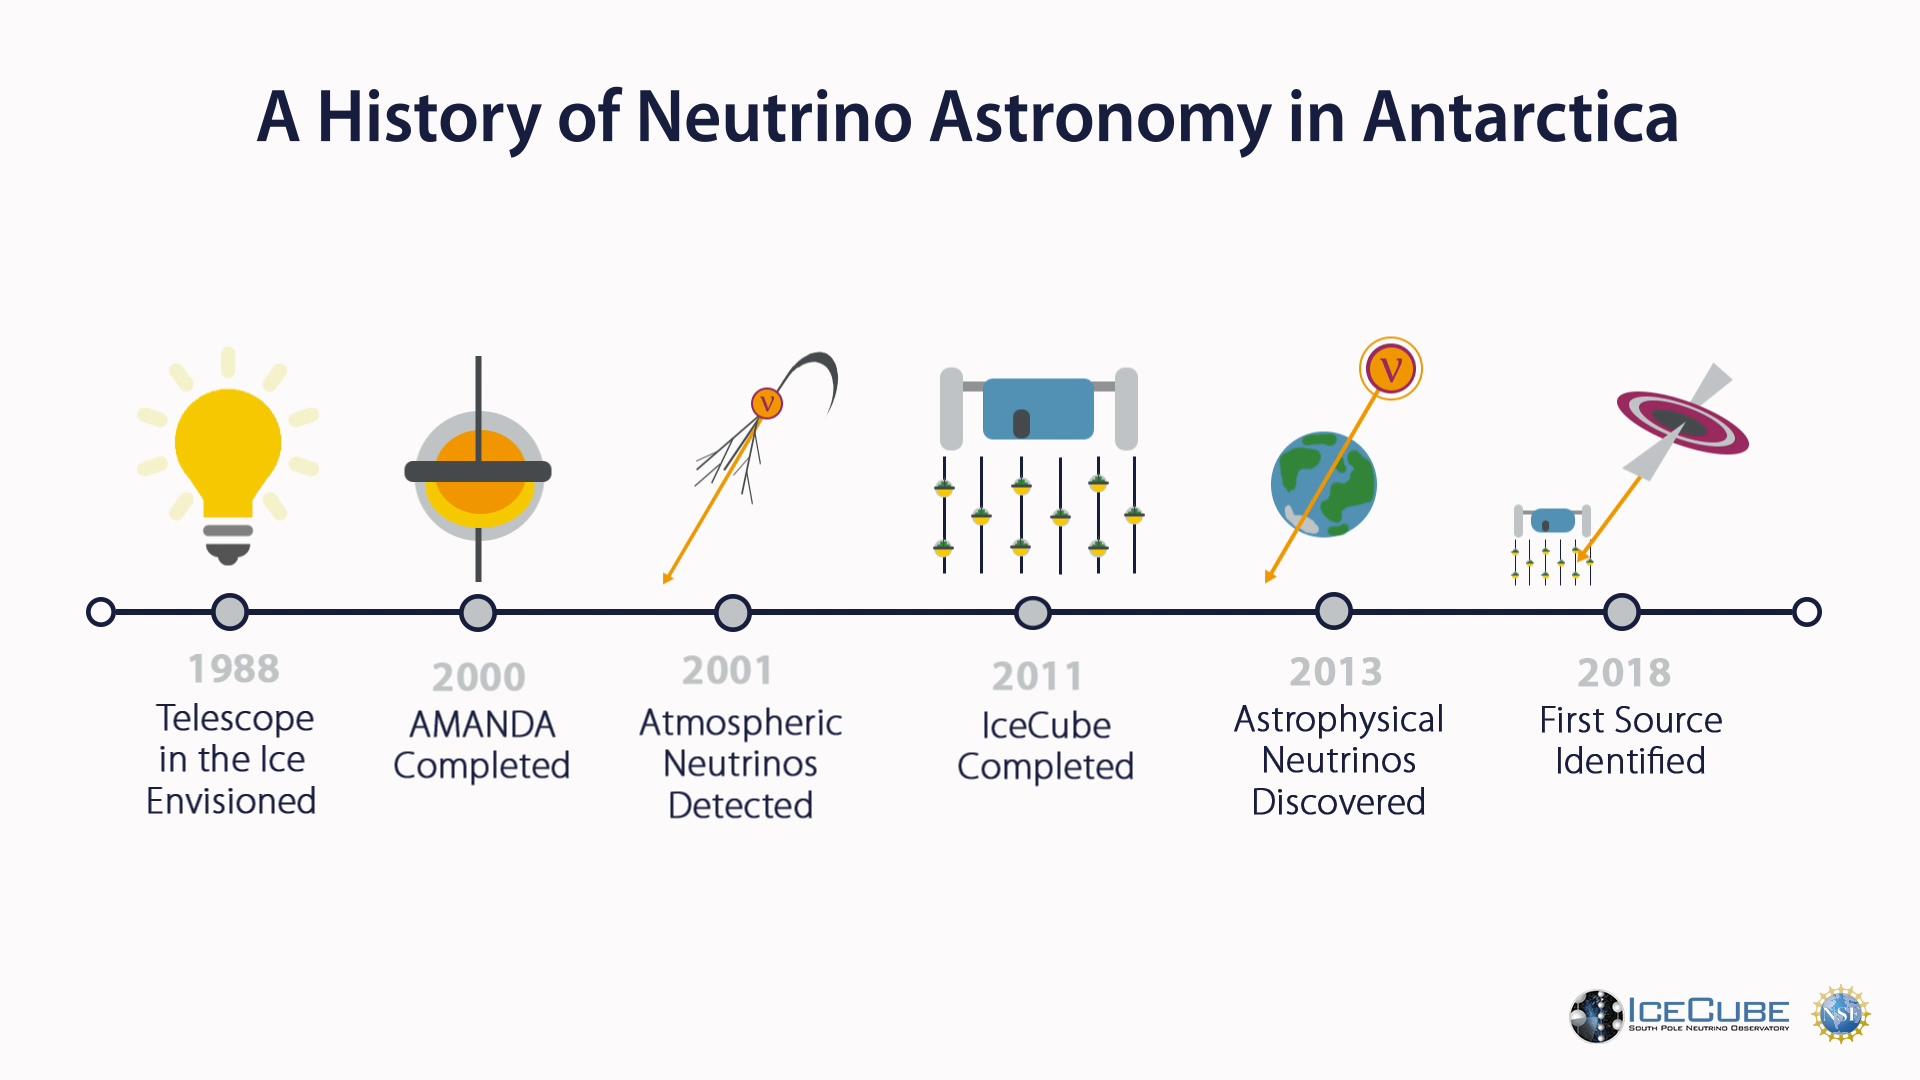 Animation: A history of neutrino astronomy in Antarctica